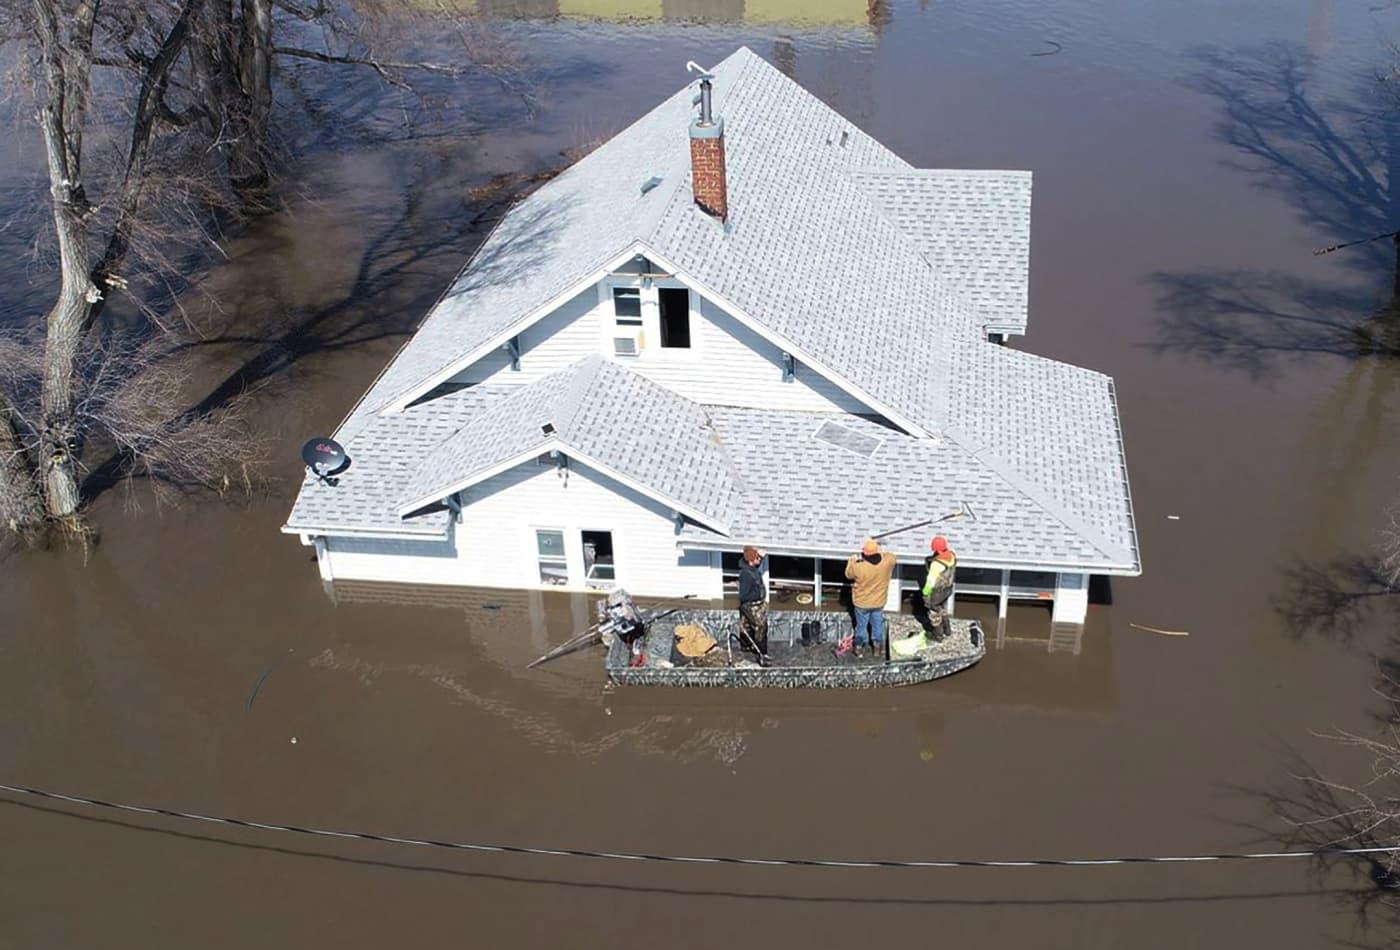 2020 hurricane season is busiest ever recorded, and National Flood Insurance Program faces $20 billion debt